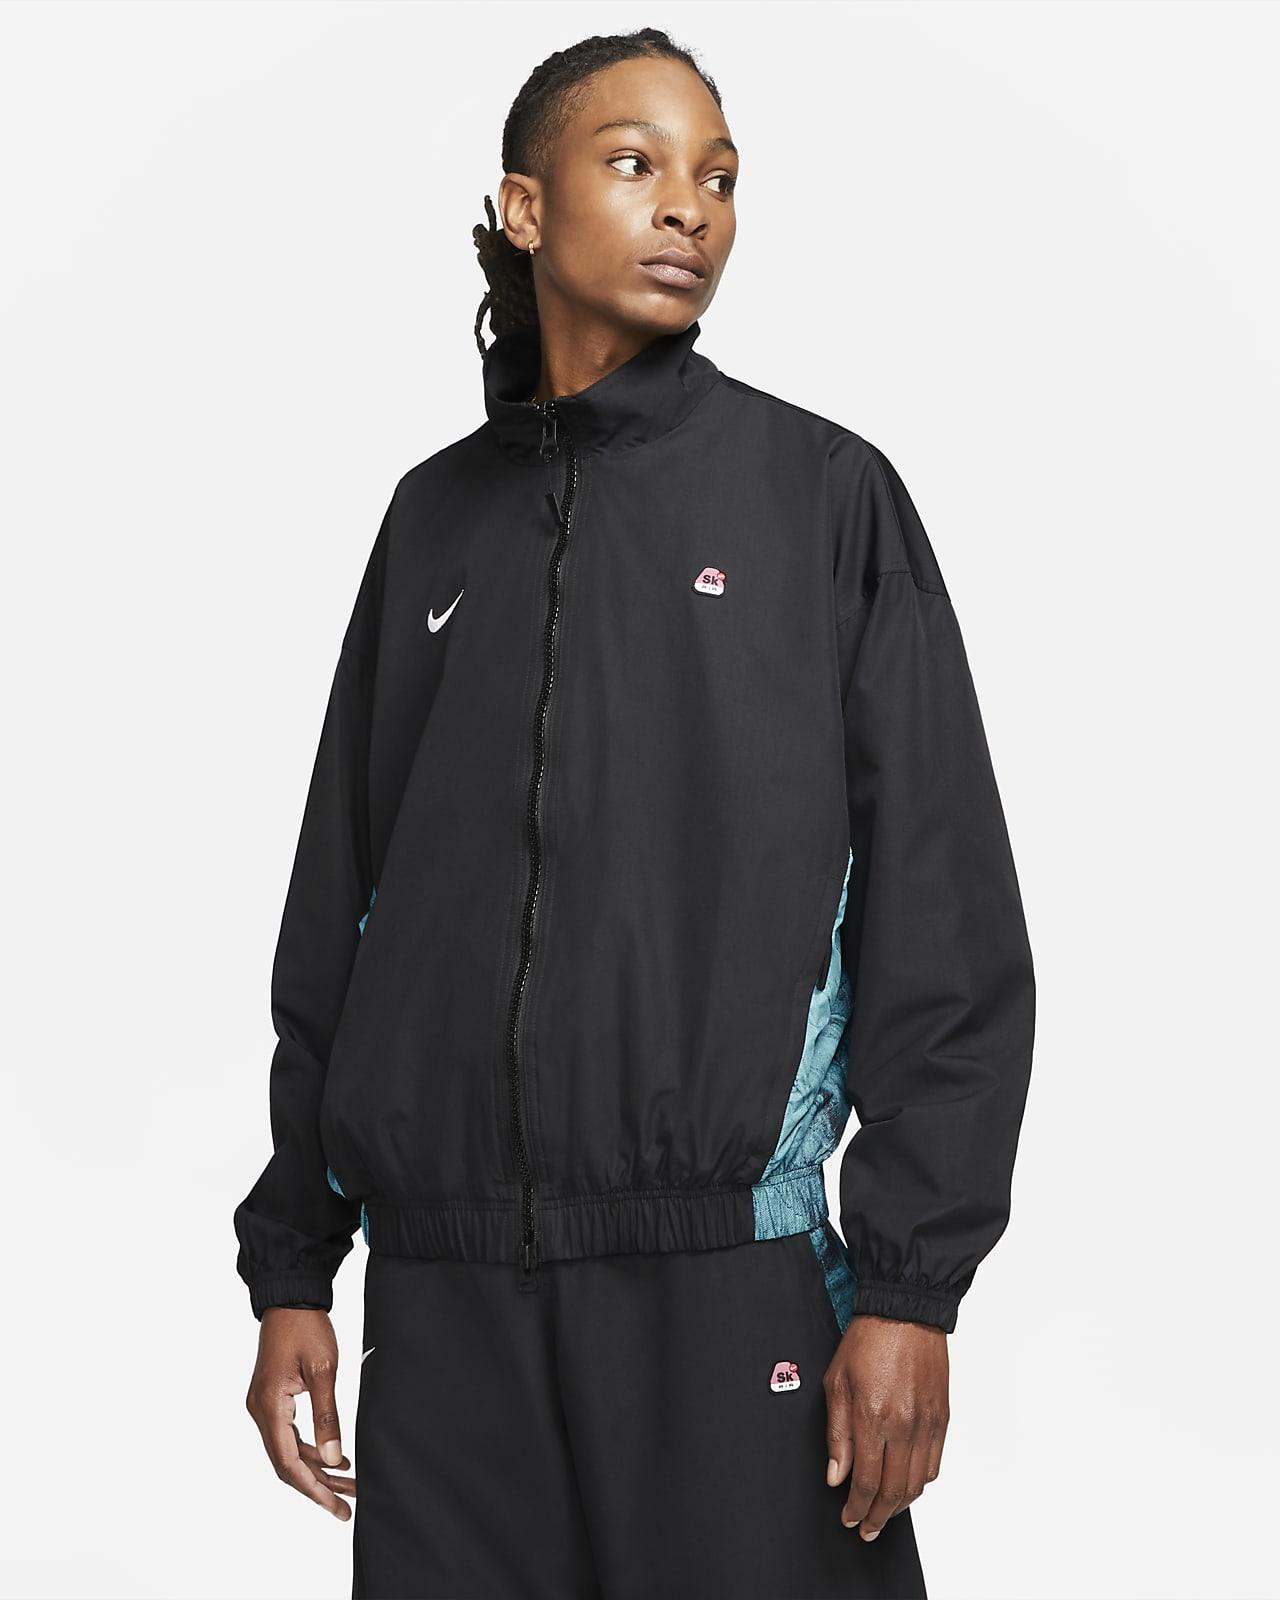 Nike x Skepta Men's Tracksuit Jacket